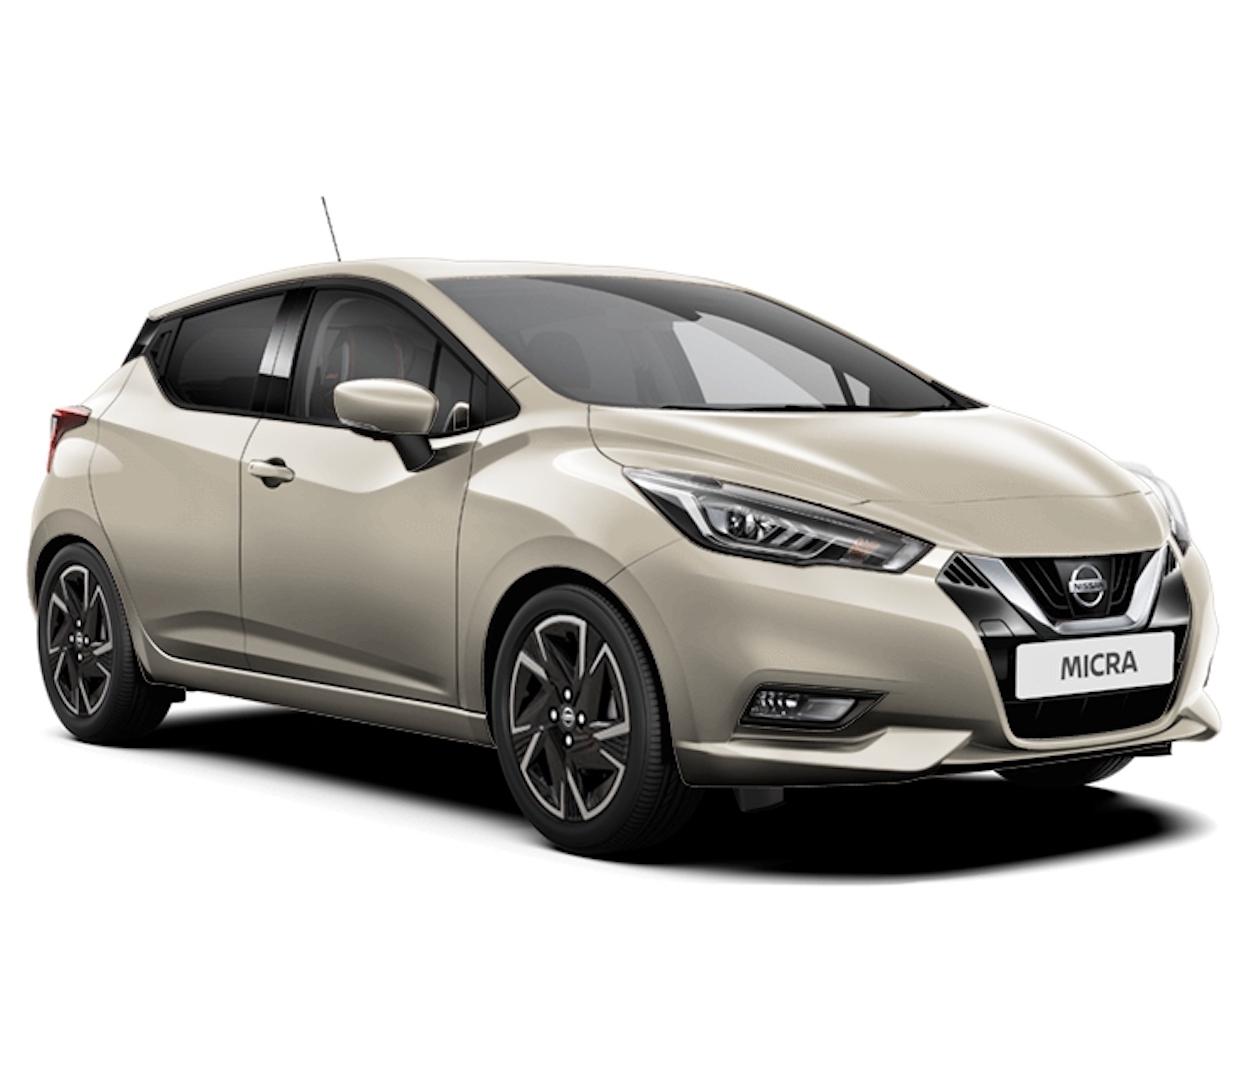 Nissan Micra versão Acenta